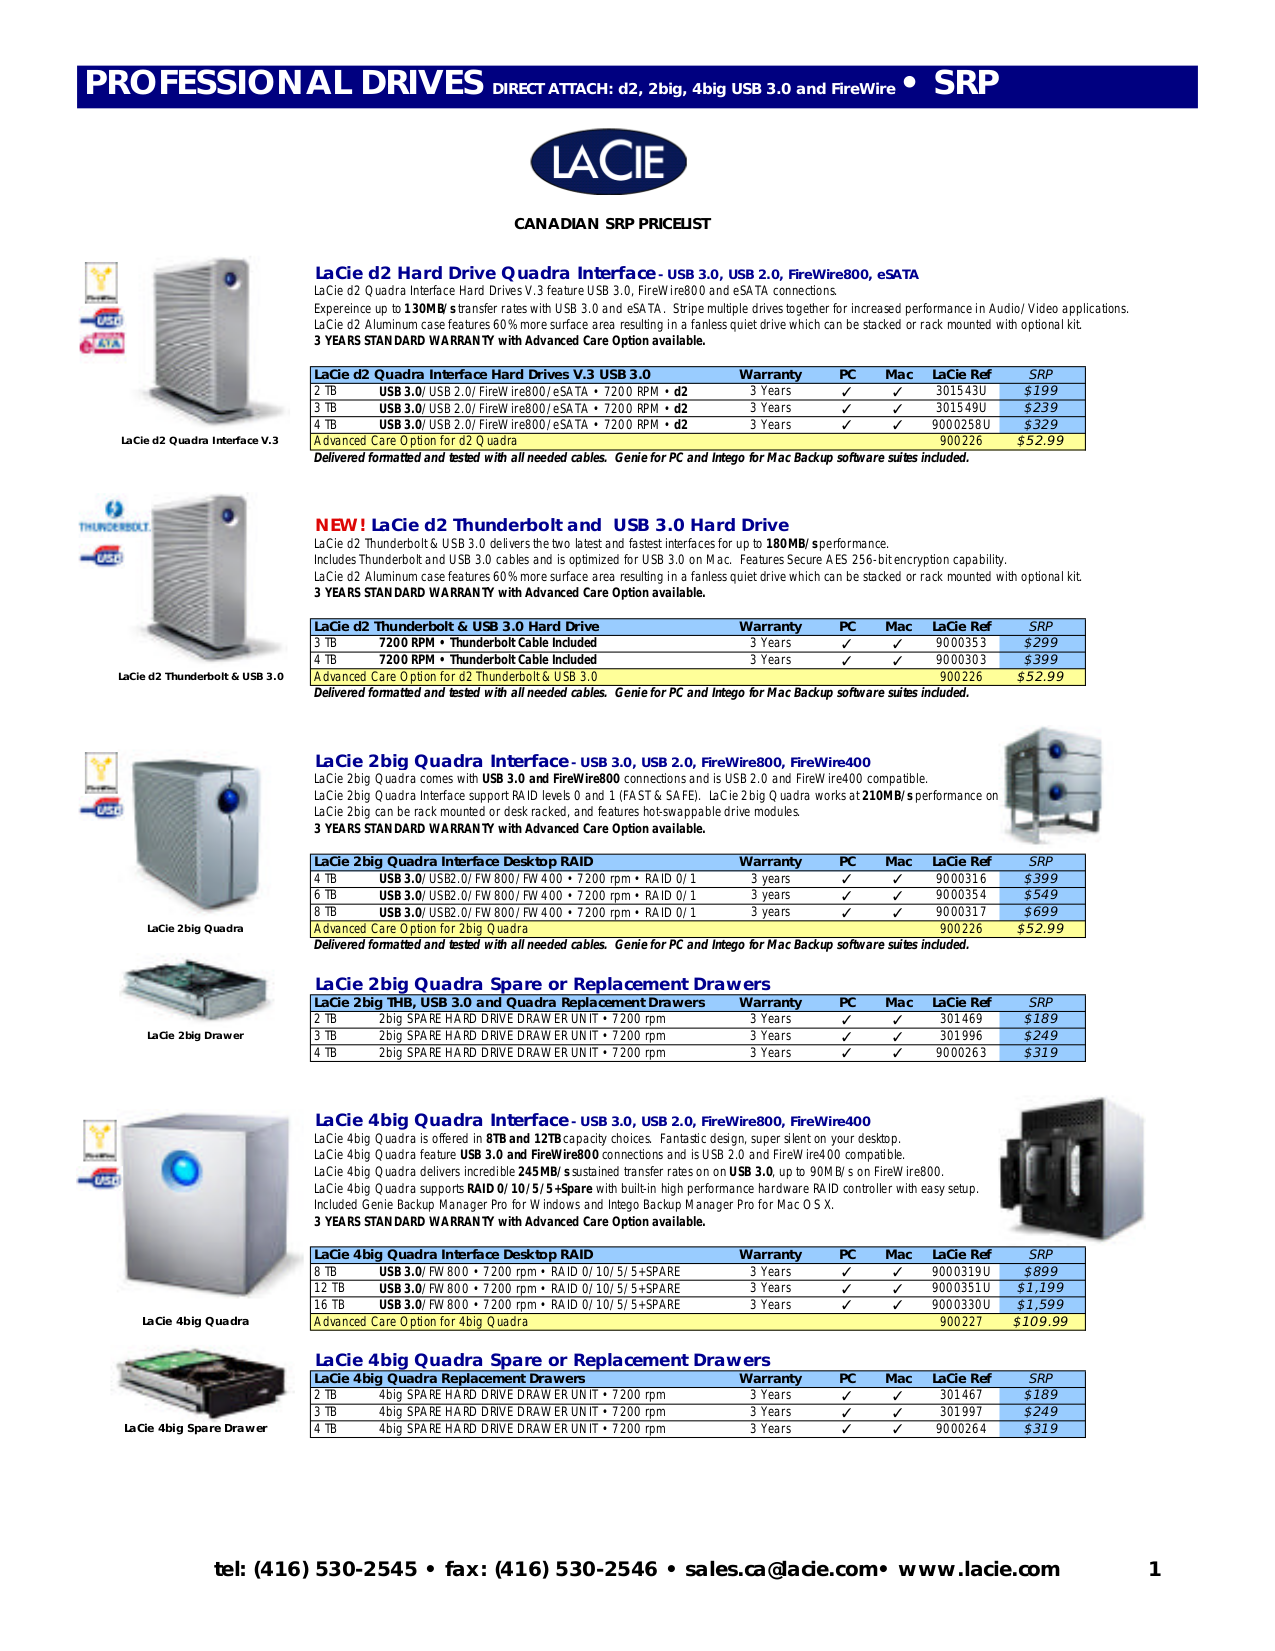 pdf for LaCie Storage 301998 manual